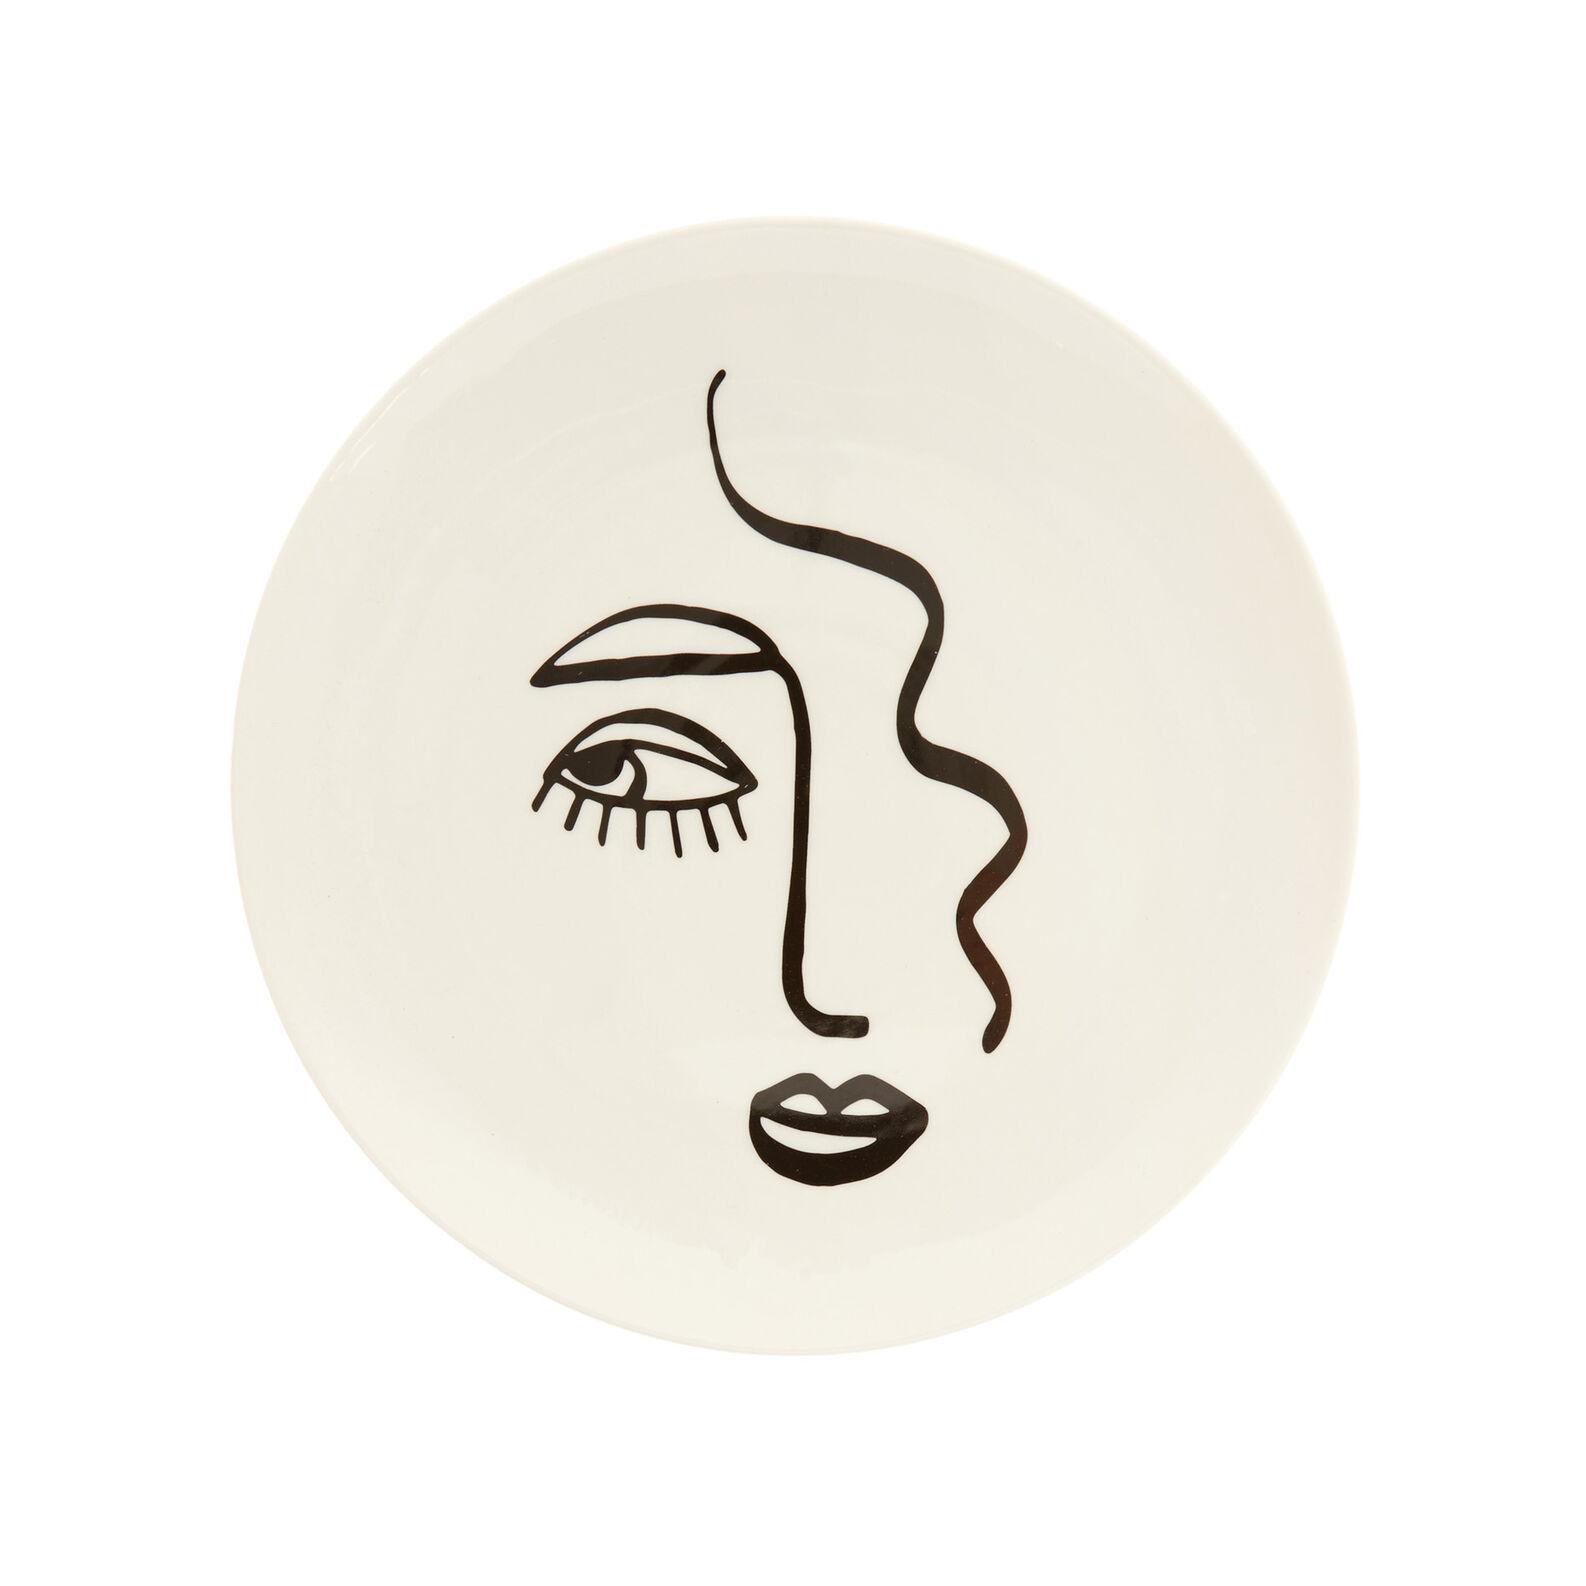 Porcelain serving dish with face motif